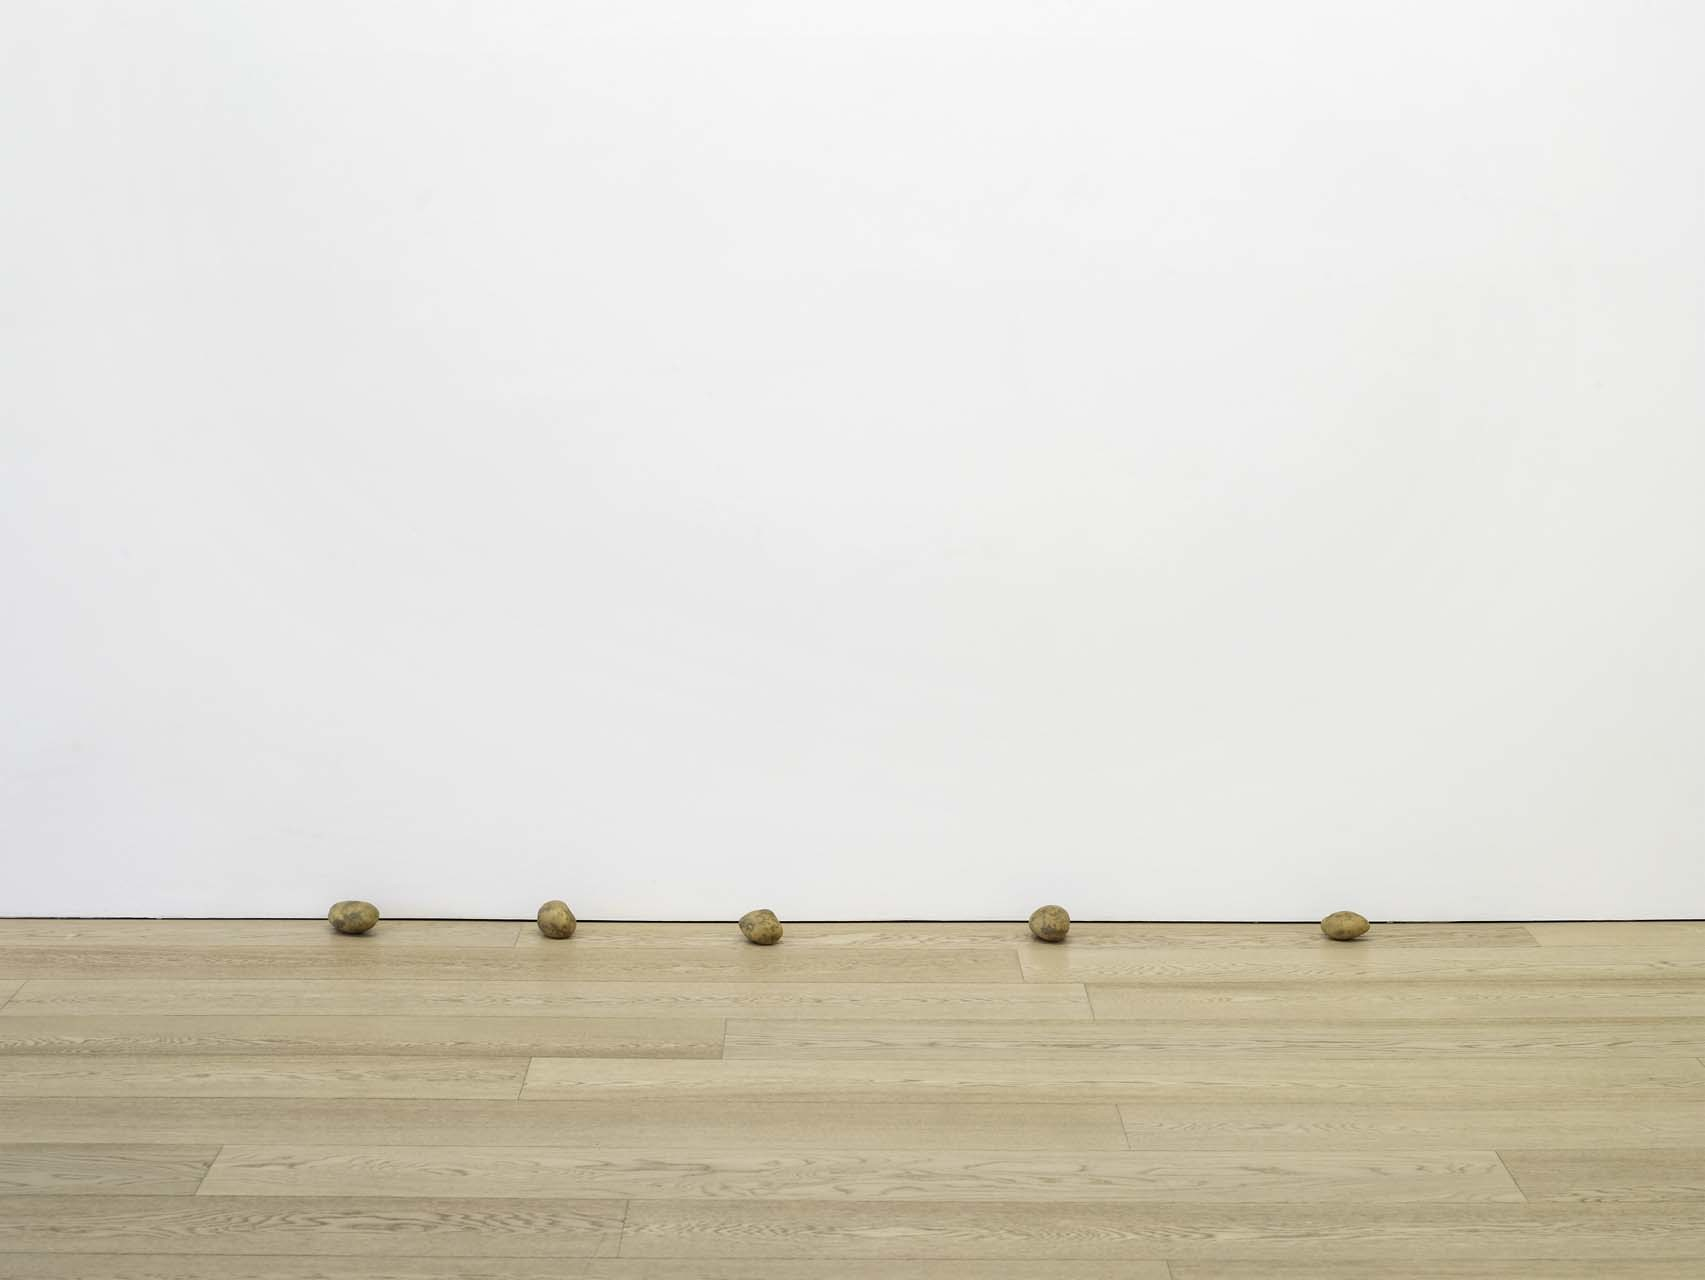 "<div class=""artwork_caption""><p>still.life. (five big potatoes in a line), 2009</p></div>"